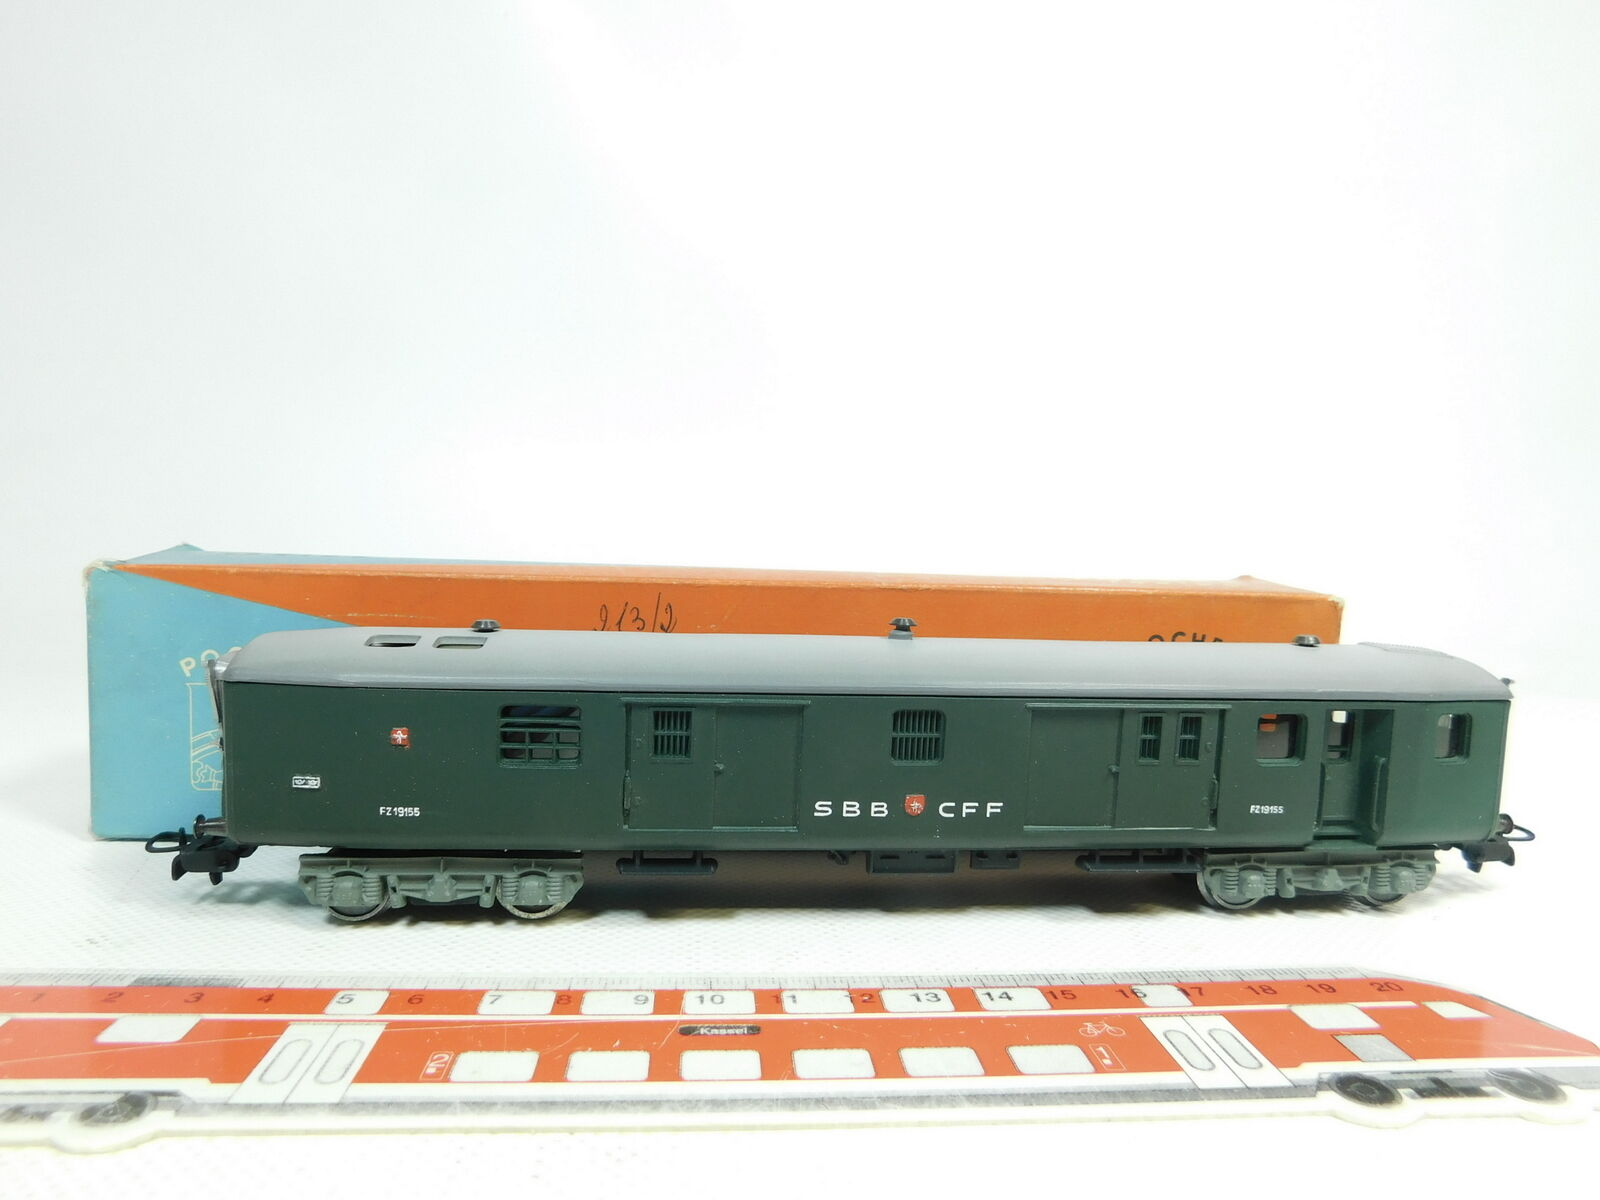 BJ150-0,5 Pocher H0   Ac Vagón Portaequipajes   Correo Fz 19155 SBB Cff ,( Ovp